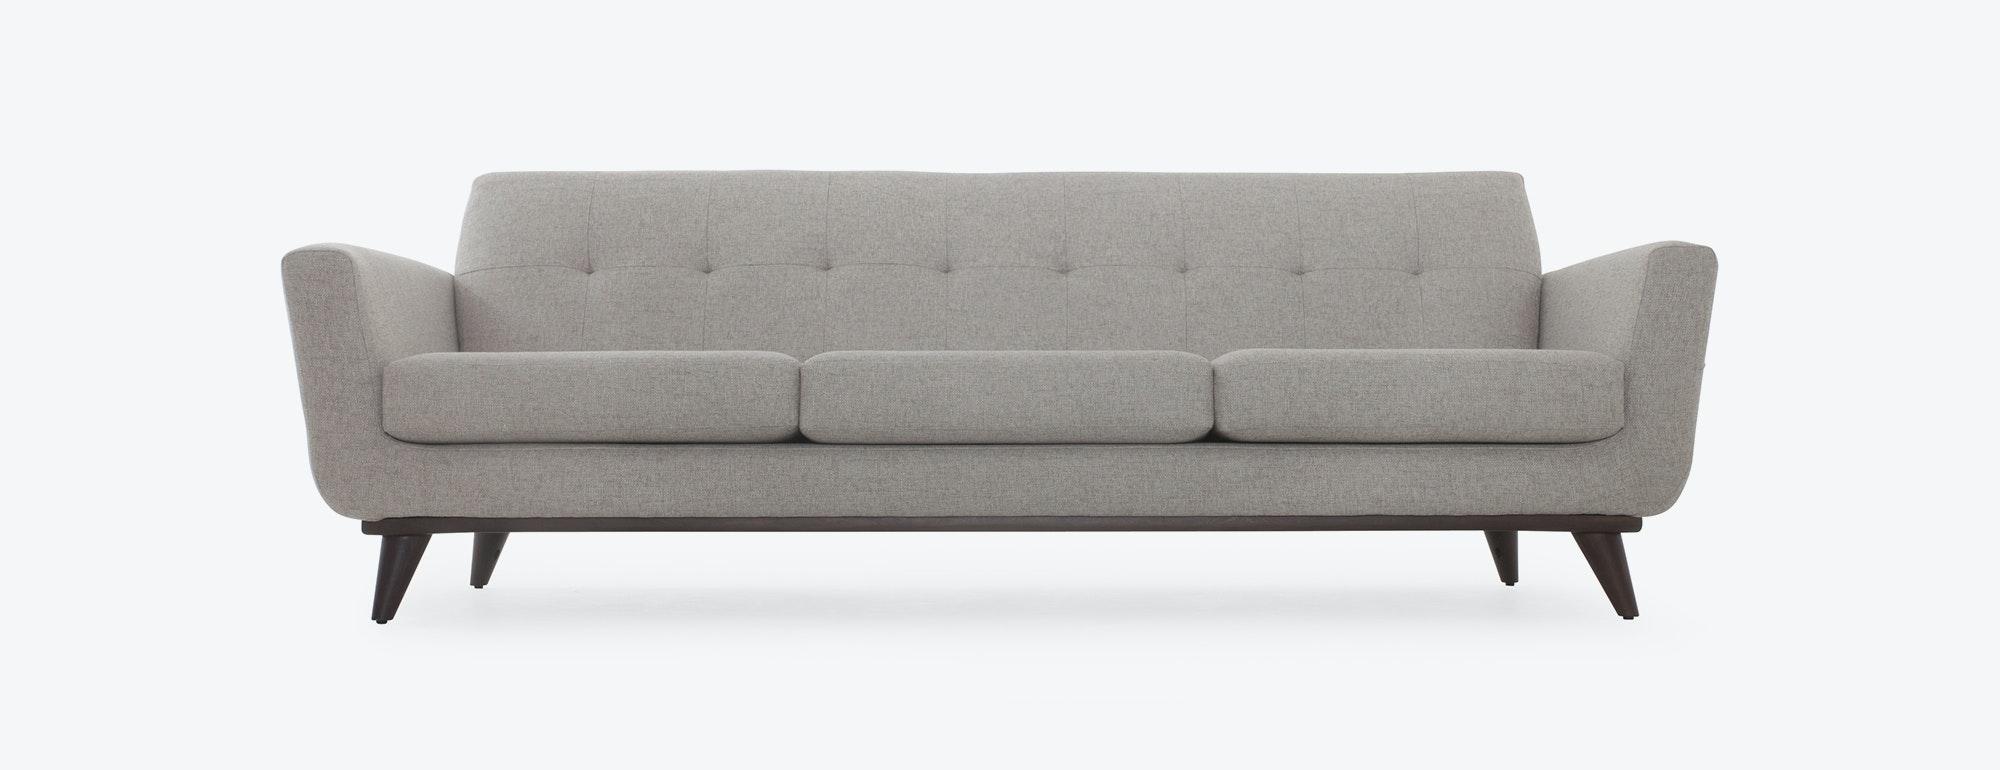 grand sofa sectionnel usage a vendre hughes joybird